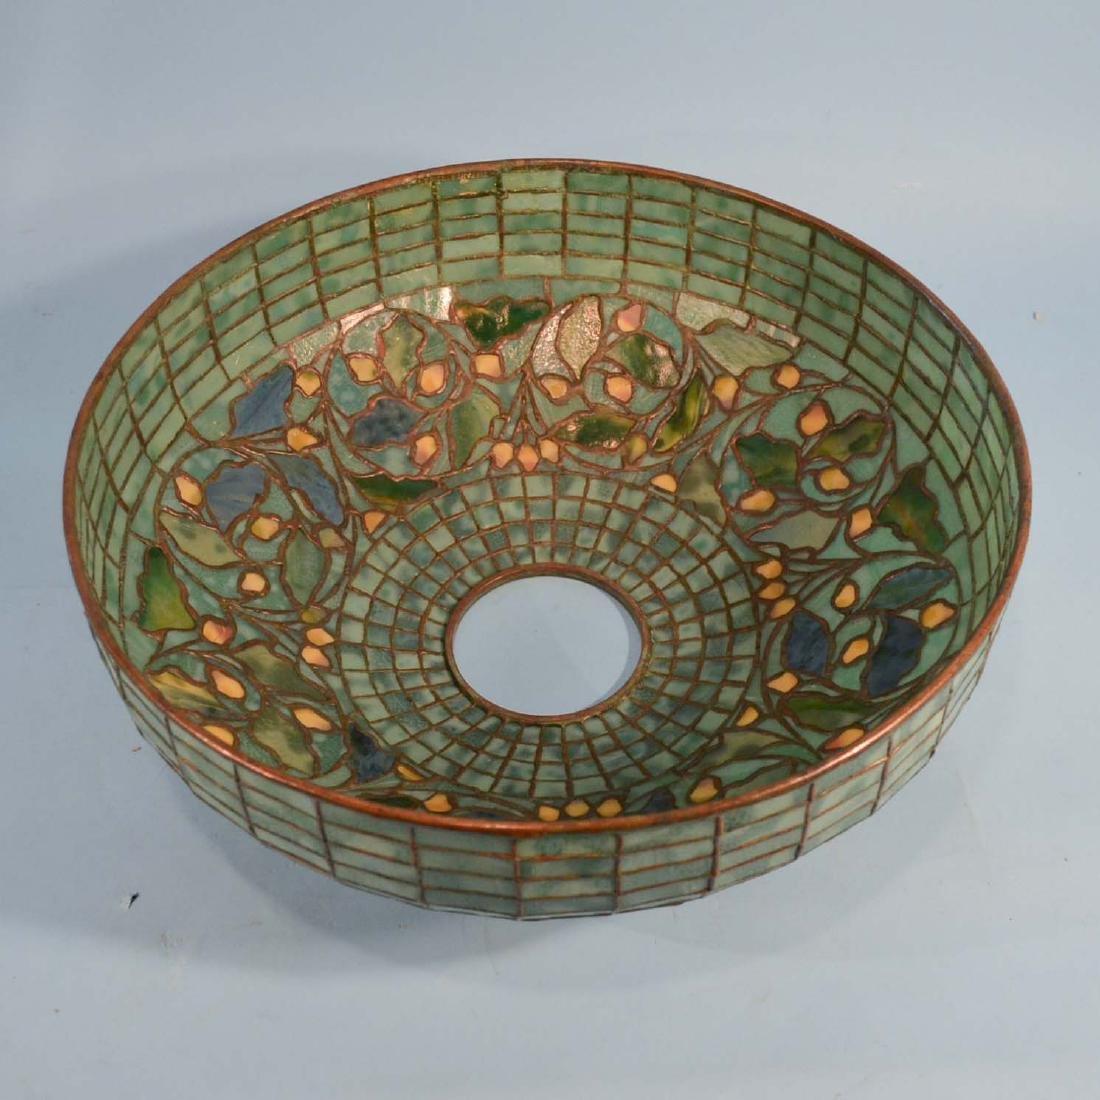 Tiffany Studios Acorn & Oak Leaf Stained Glass Lamp - 12